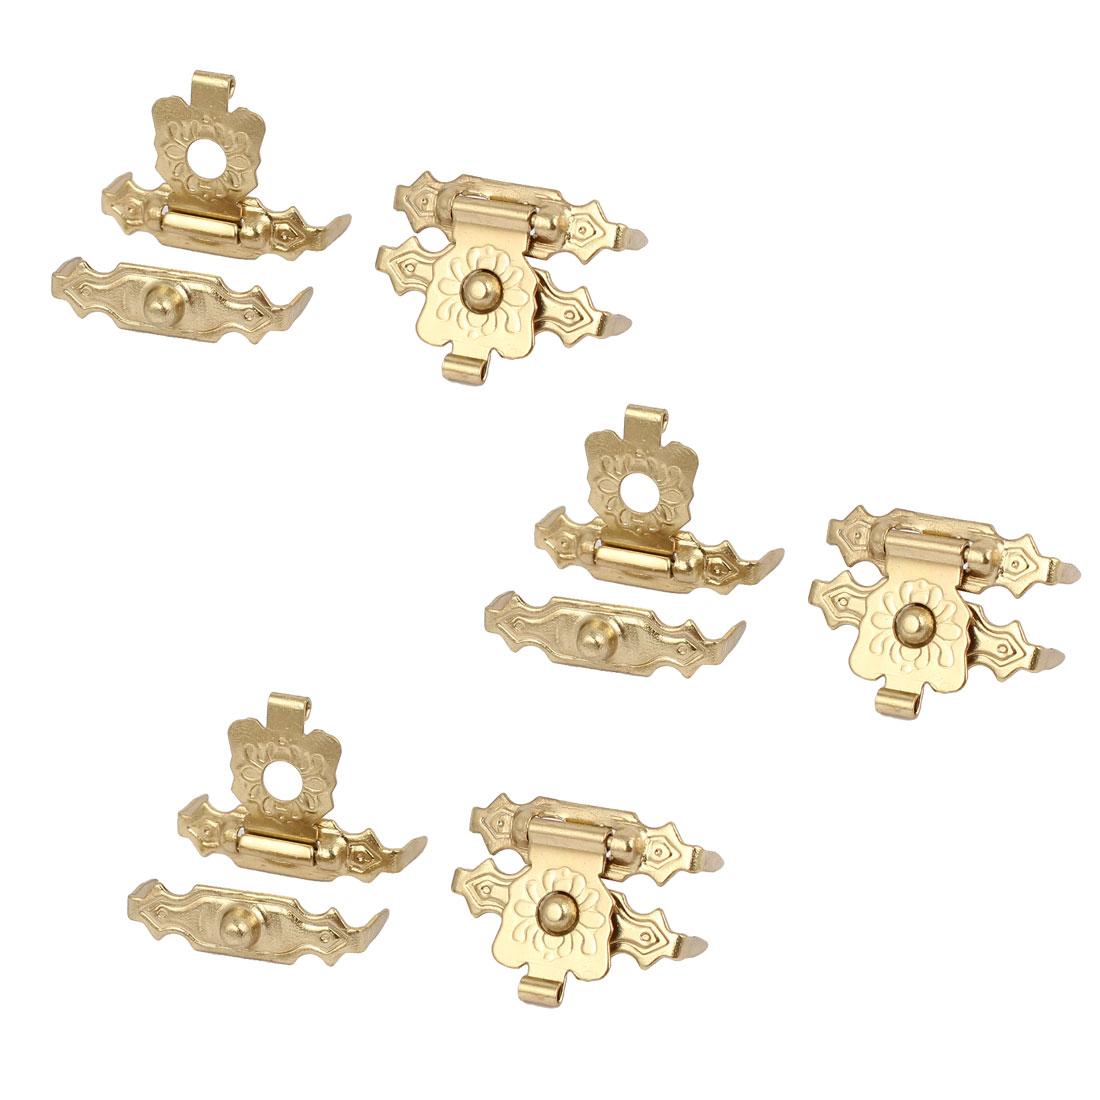 Box Wooden Case Metal Hasp Hook Lock Lid Latch Catch Gold Tone 6pcs